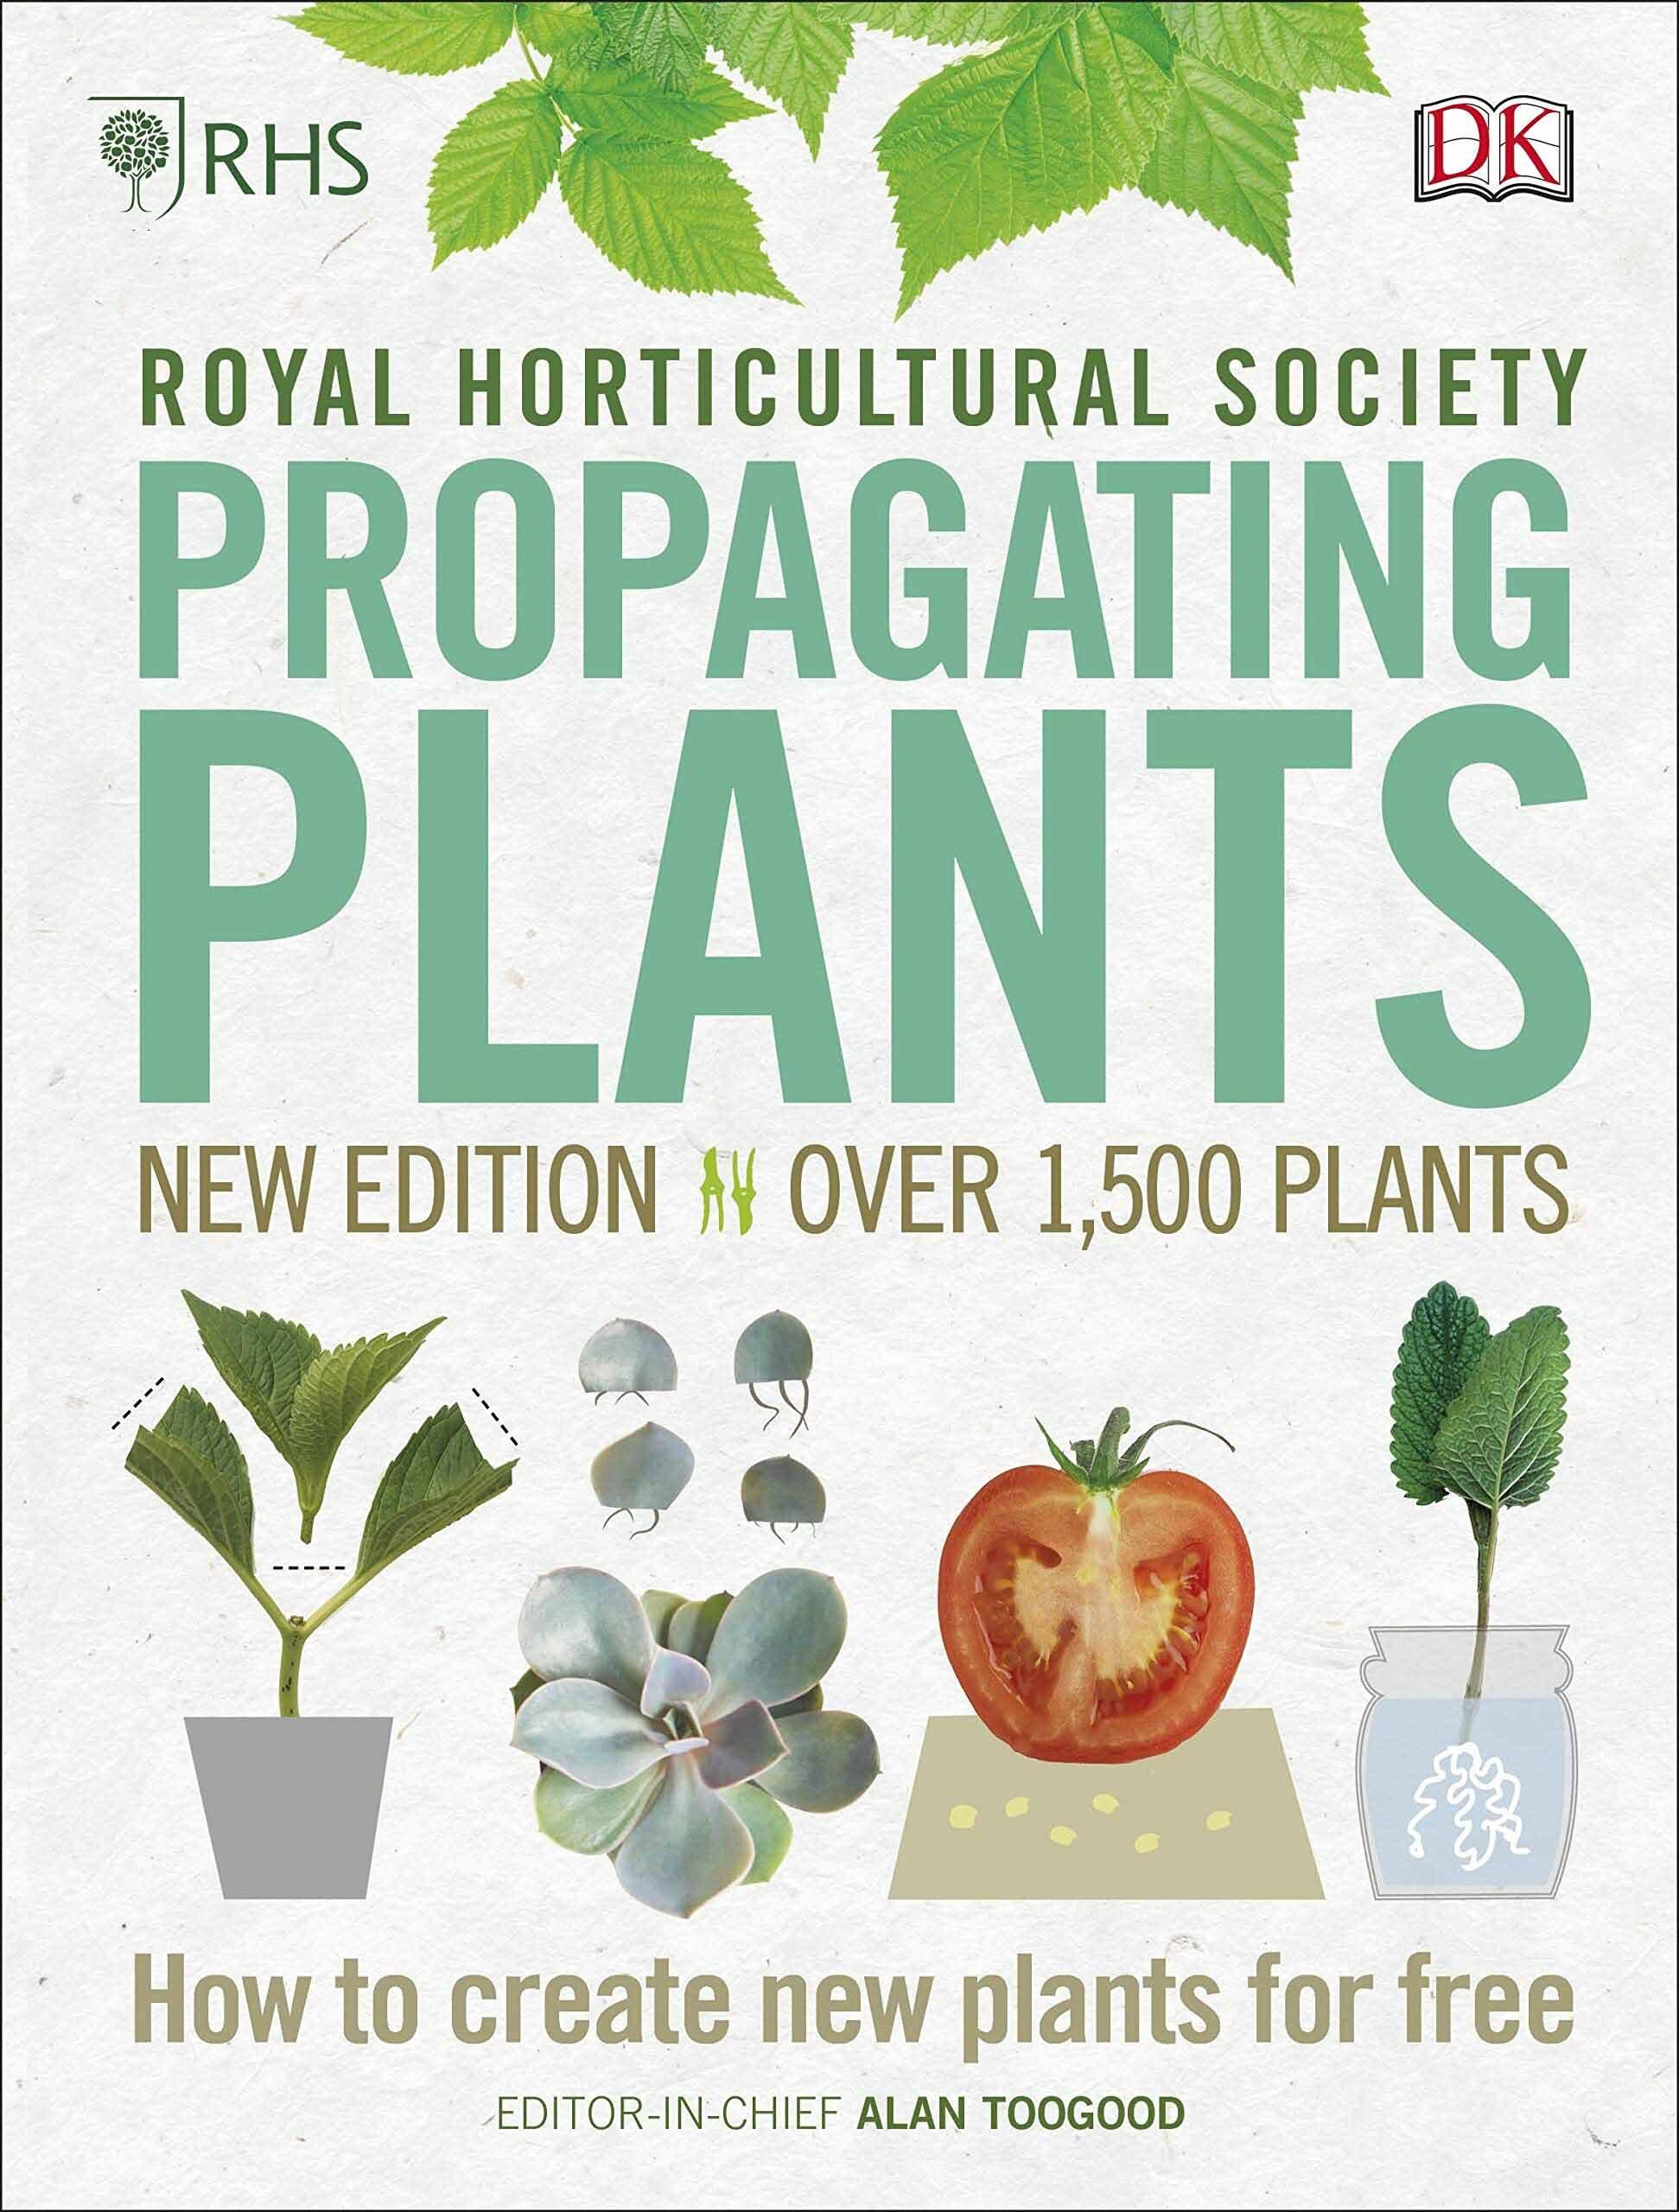 rhs_propagating_plants.jpg